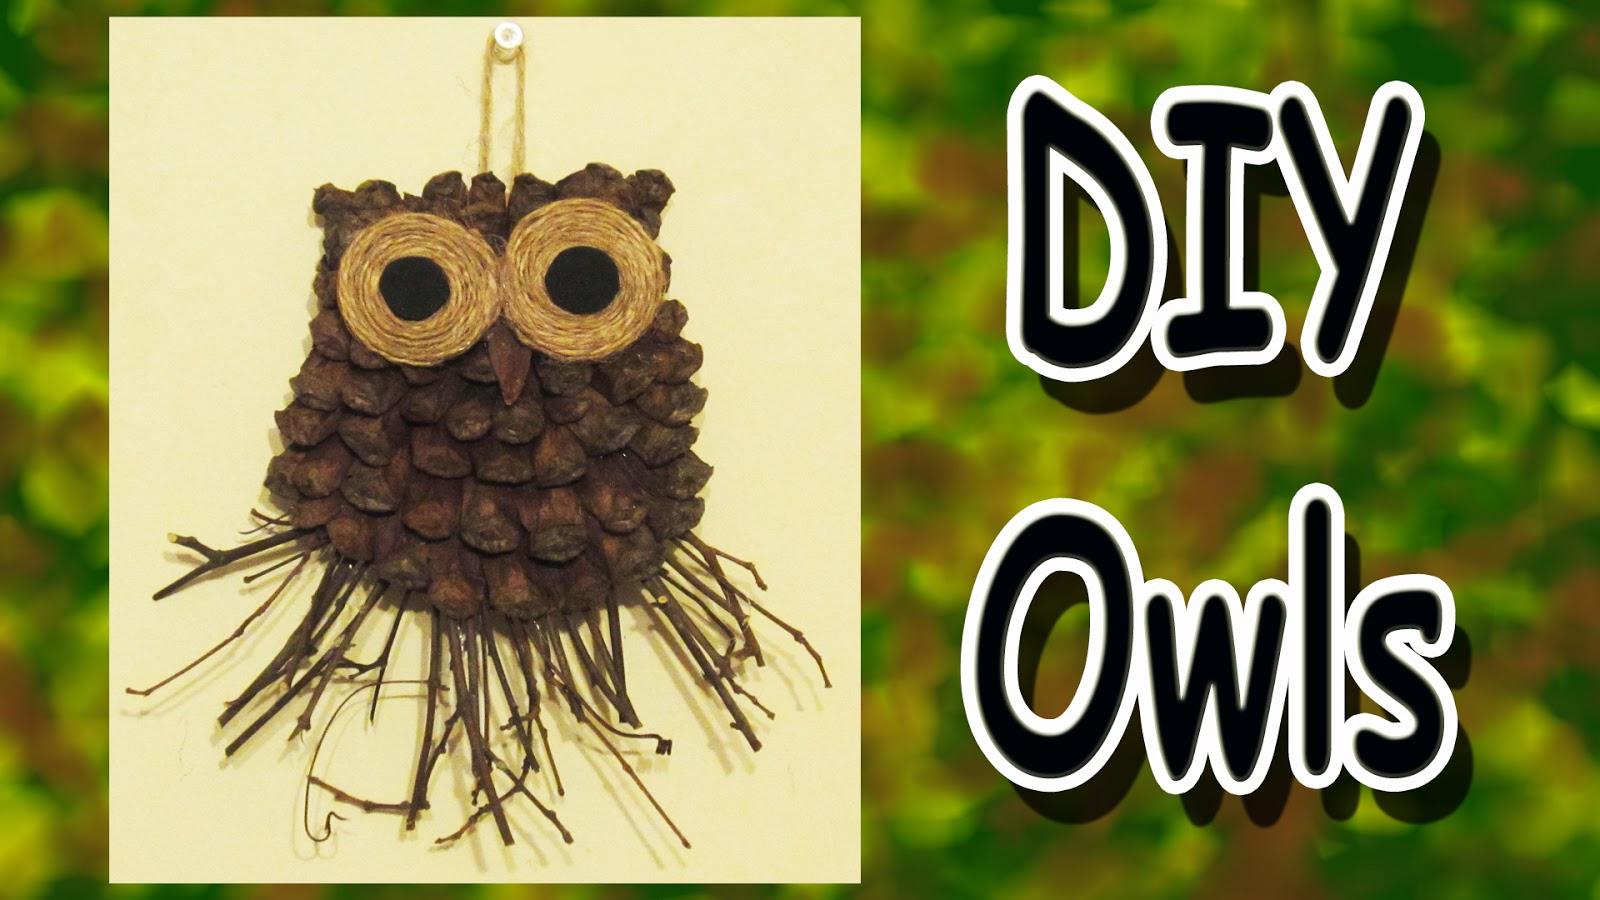 easymeworld diy owl decorations a gift idea